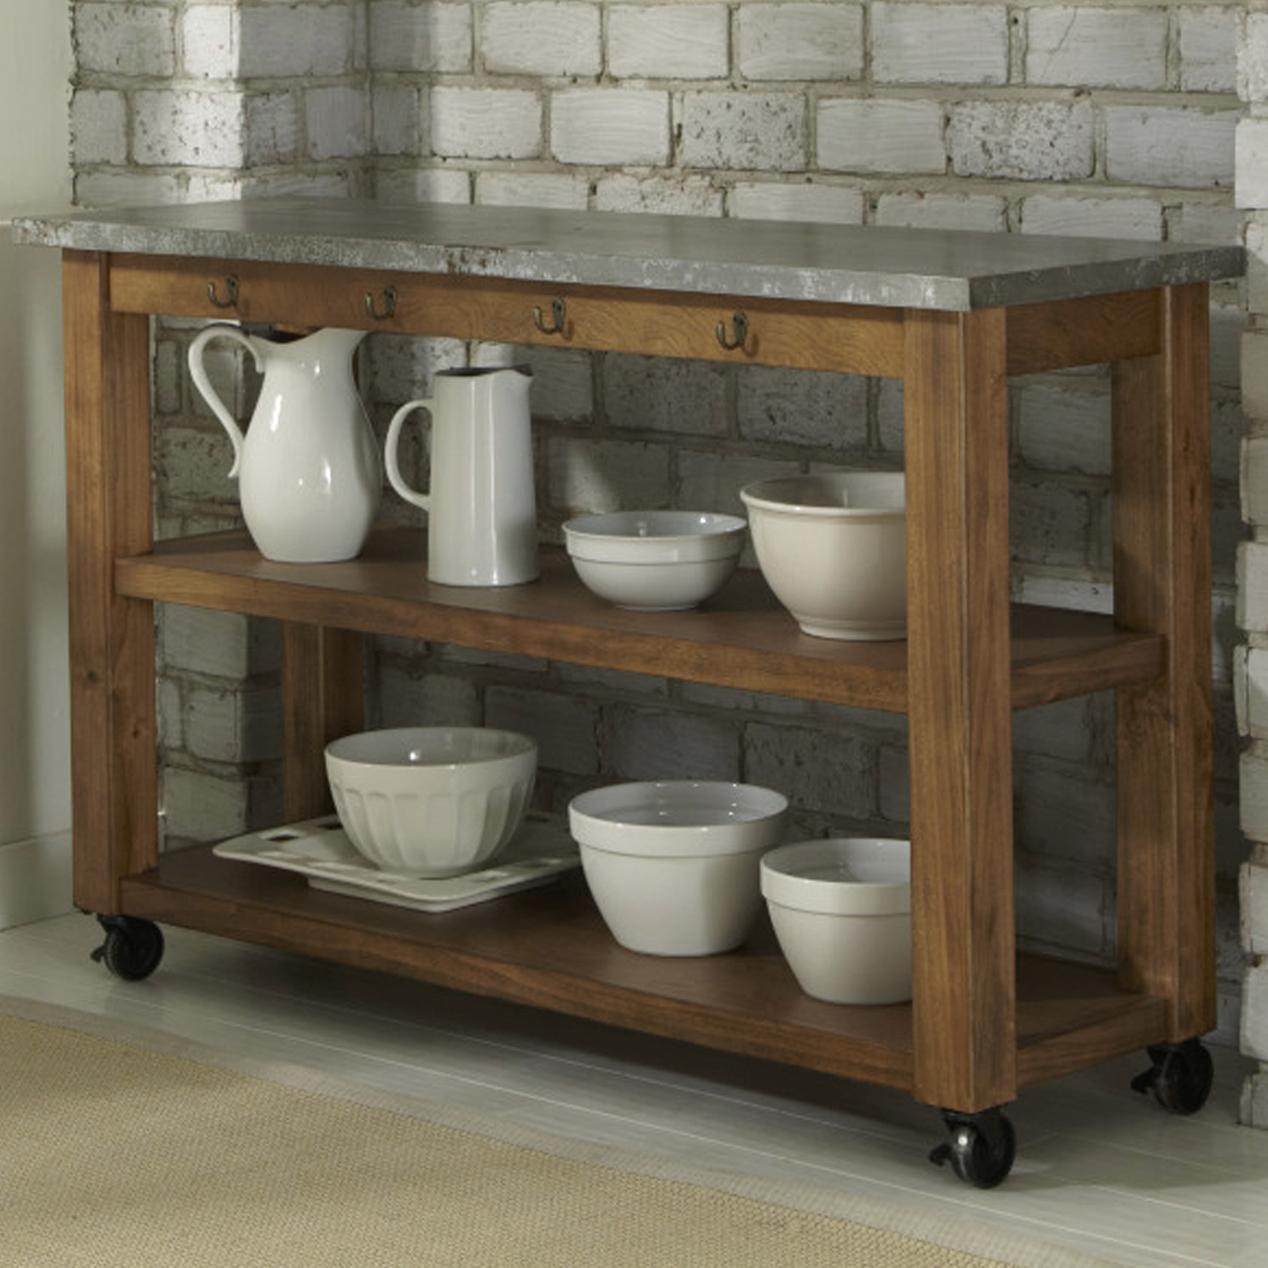 Liberty Furniture Keaton Kitchen Server - Item Number: 119-SR5666